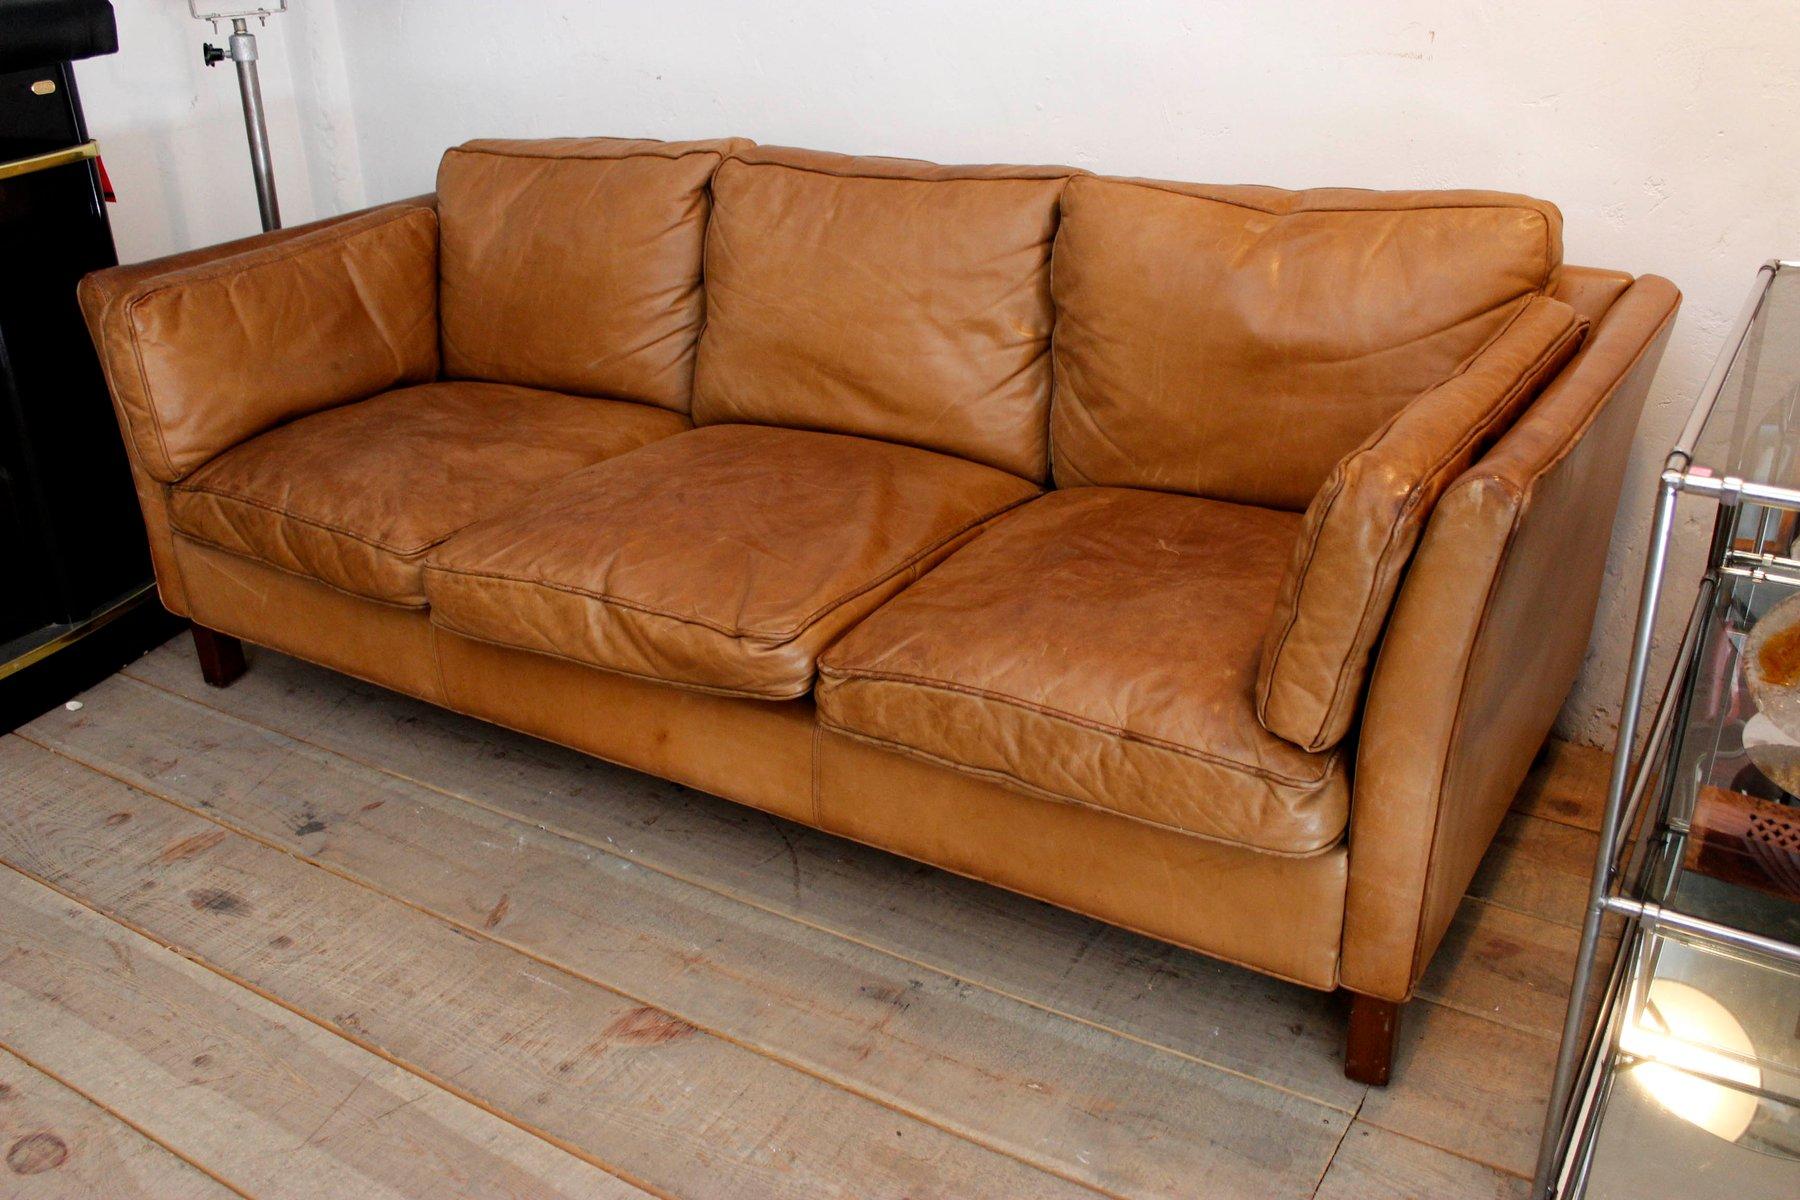 3 sitzer ledersofa von b rge mogensen f r fredericia 1963. Black Bedroom Furniture Sets. Home Design Ideas